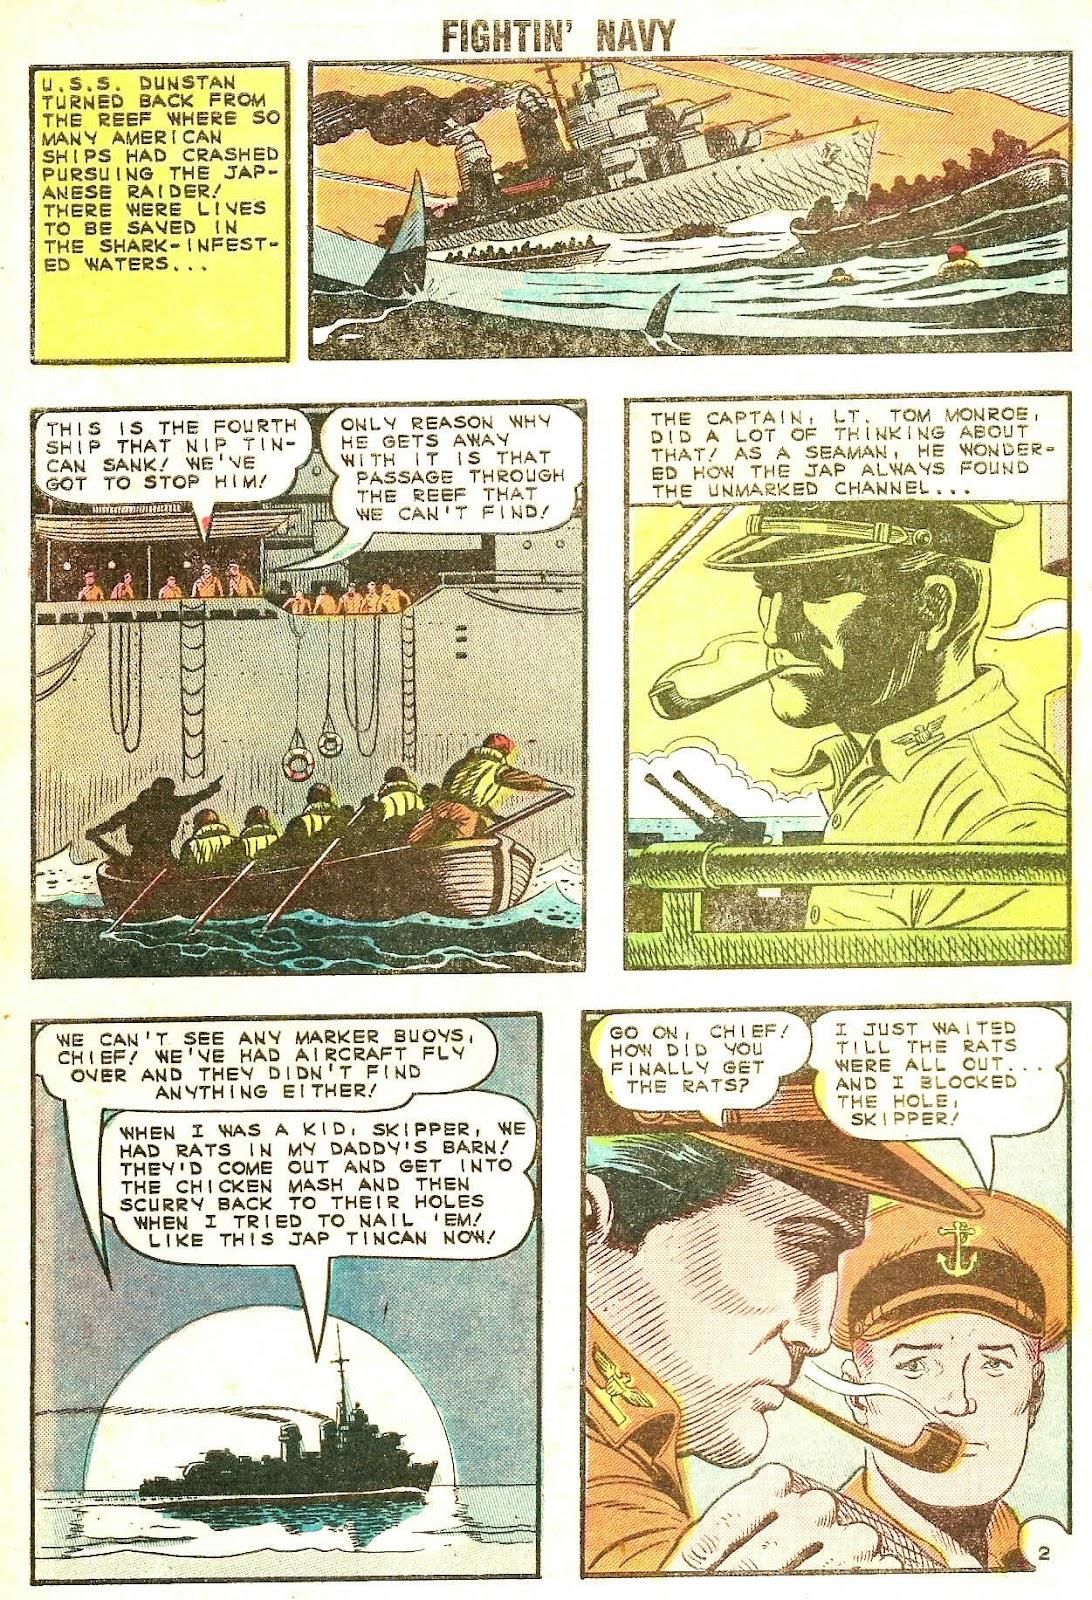 Read online Fightin' Navy comic -  Issue #120 - 4